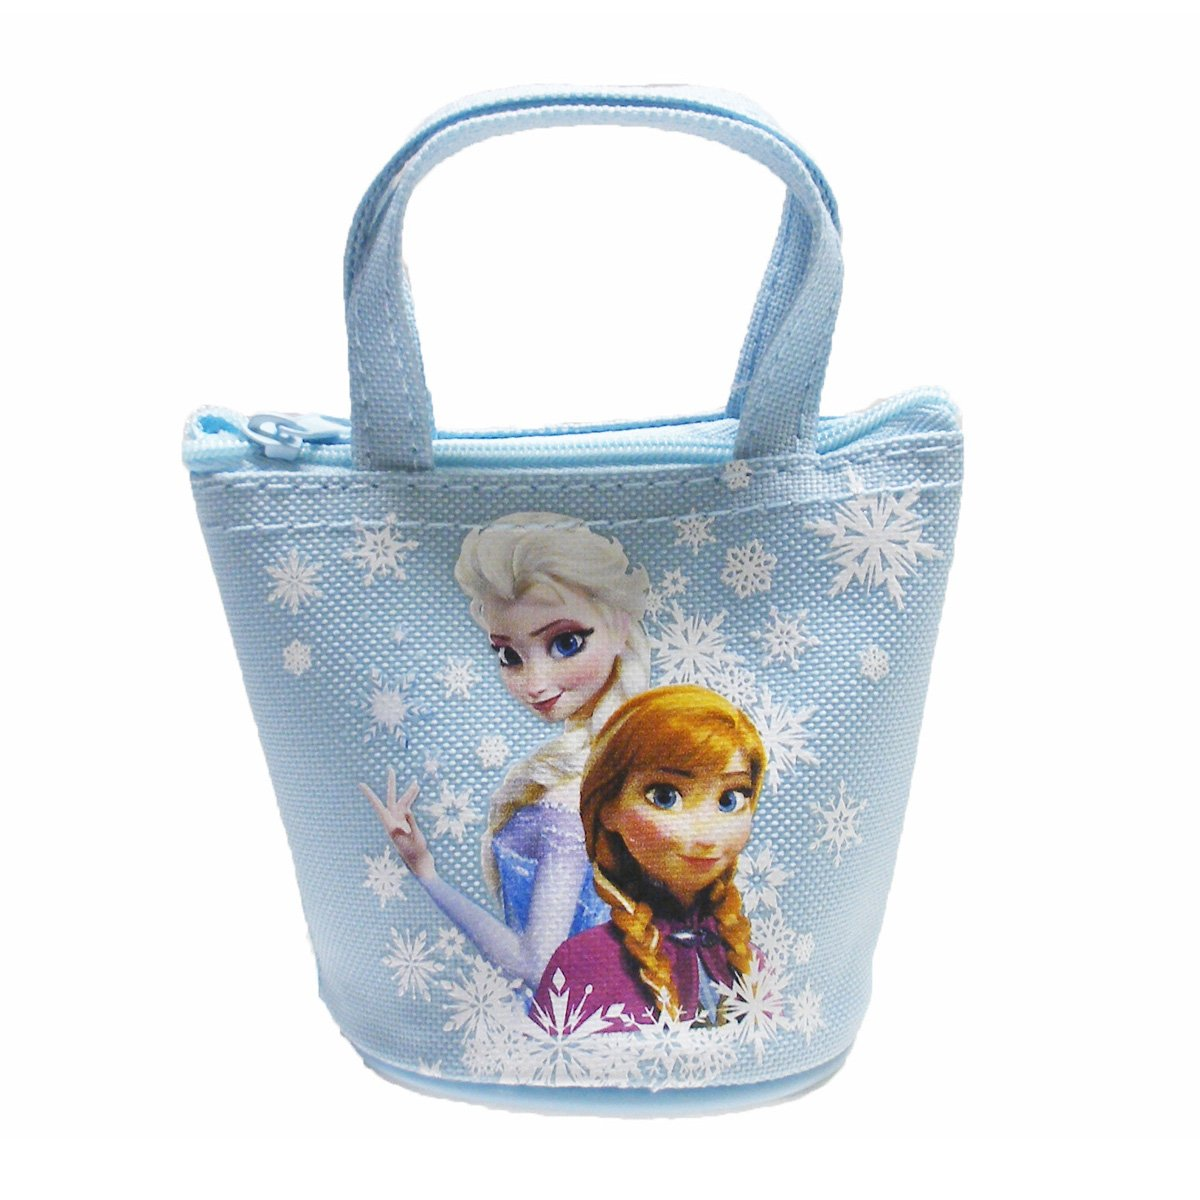 Officially Licensed Disney Frozen Handbag Image 1